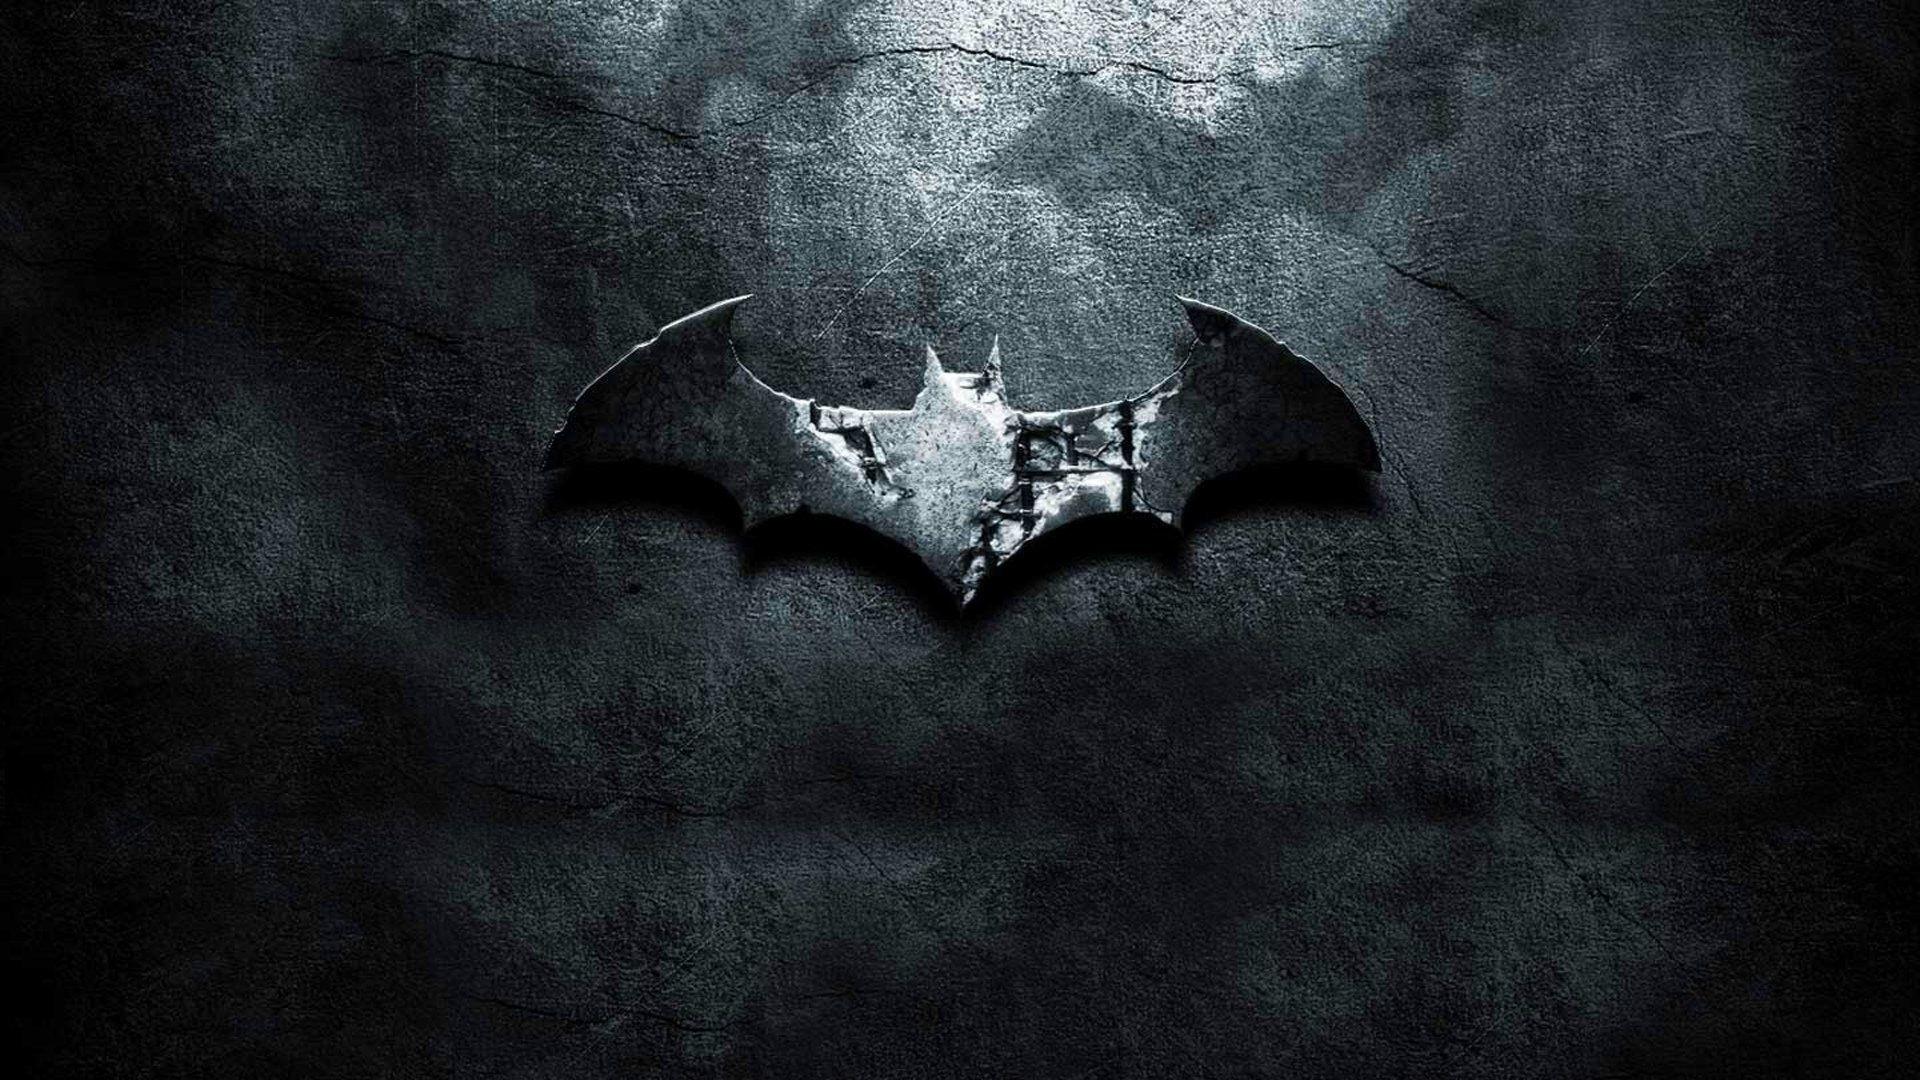 480×800 Modern Batman Logo Galaxy s2 wallpaper   Adorable Wallpapers    Pinterest   Galaxy s2, Batman and Wallpaper